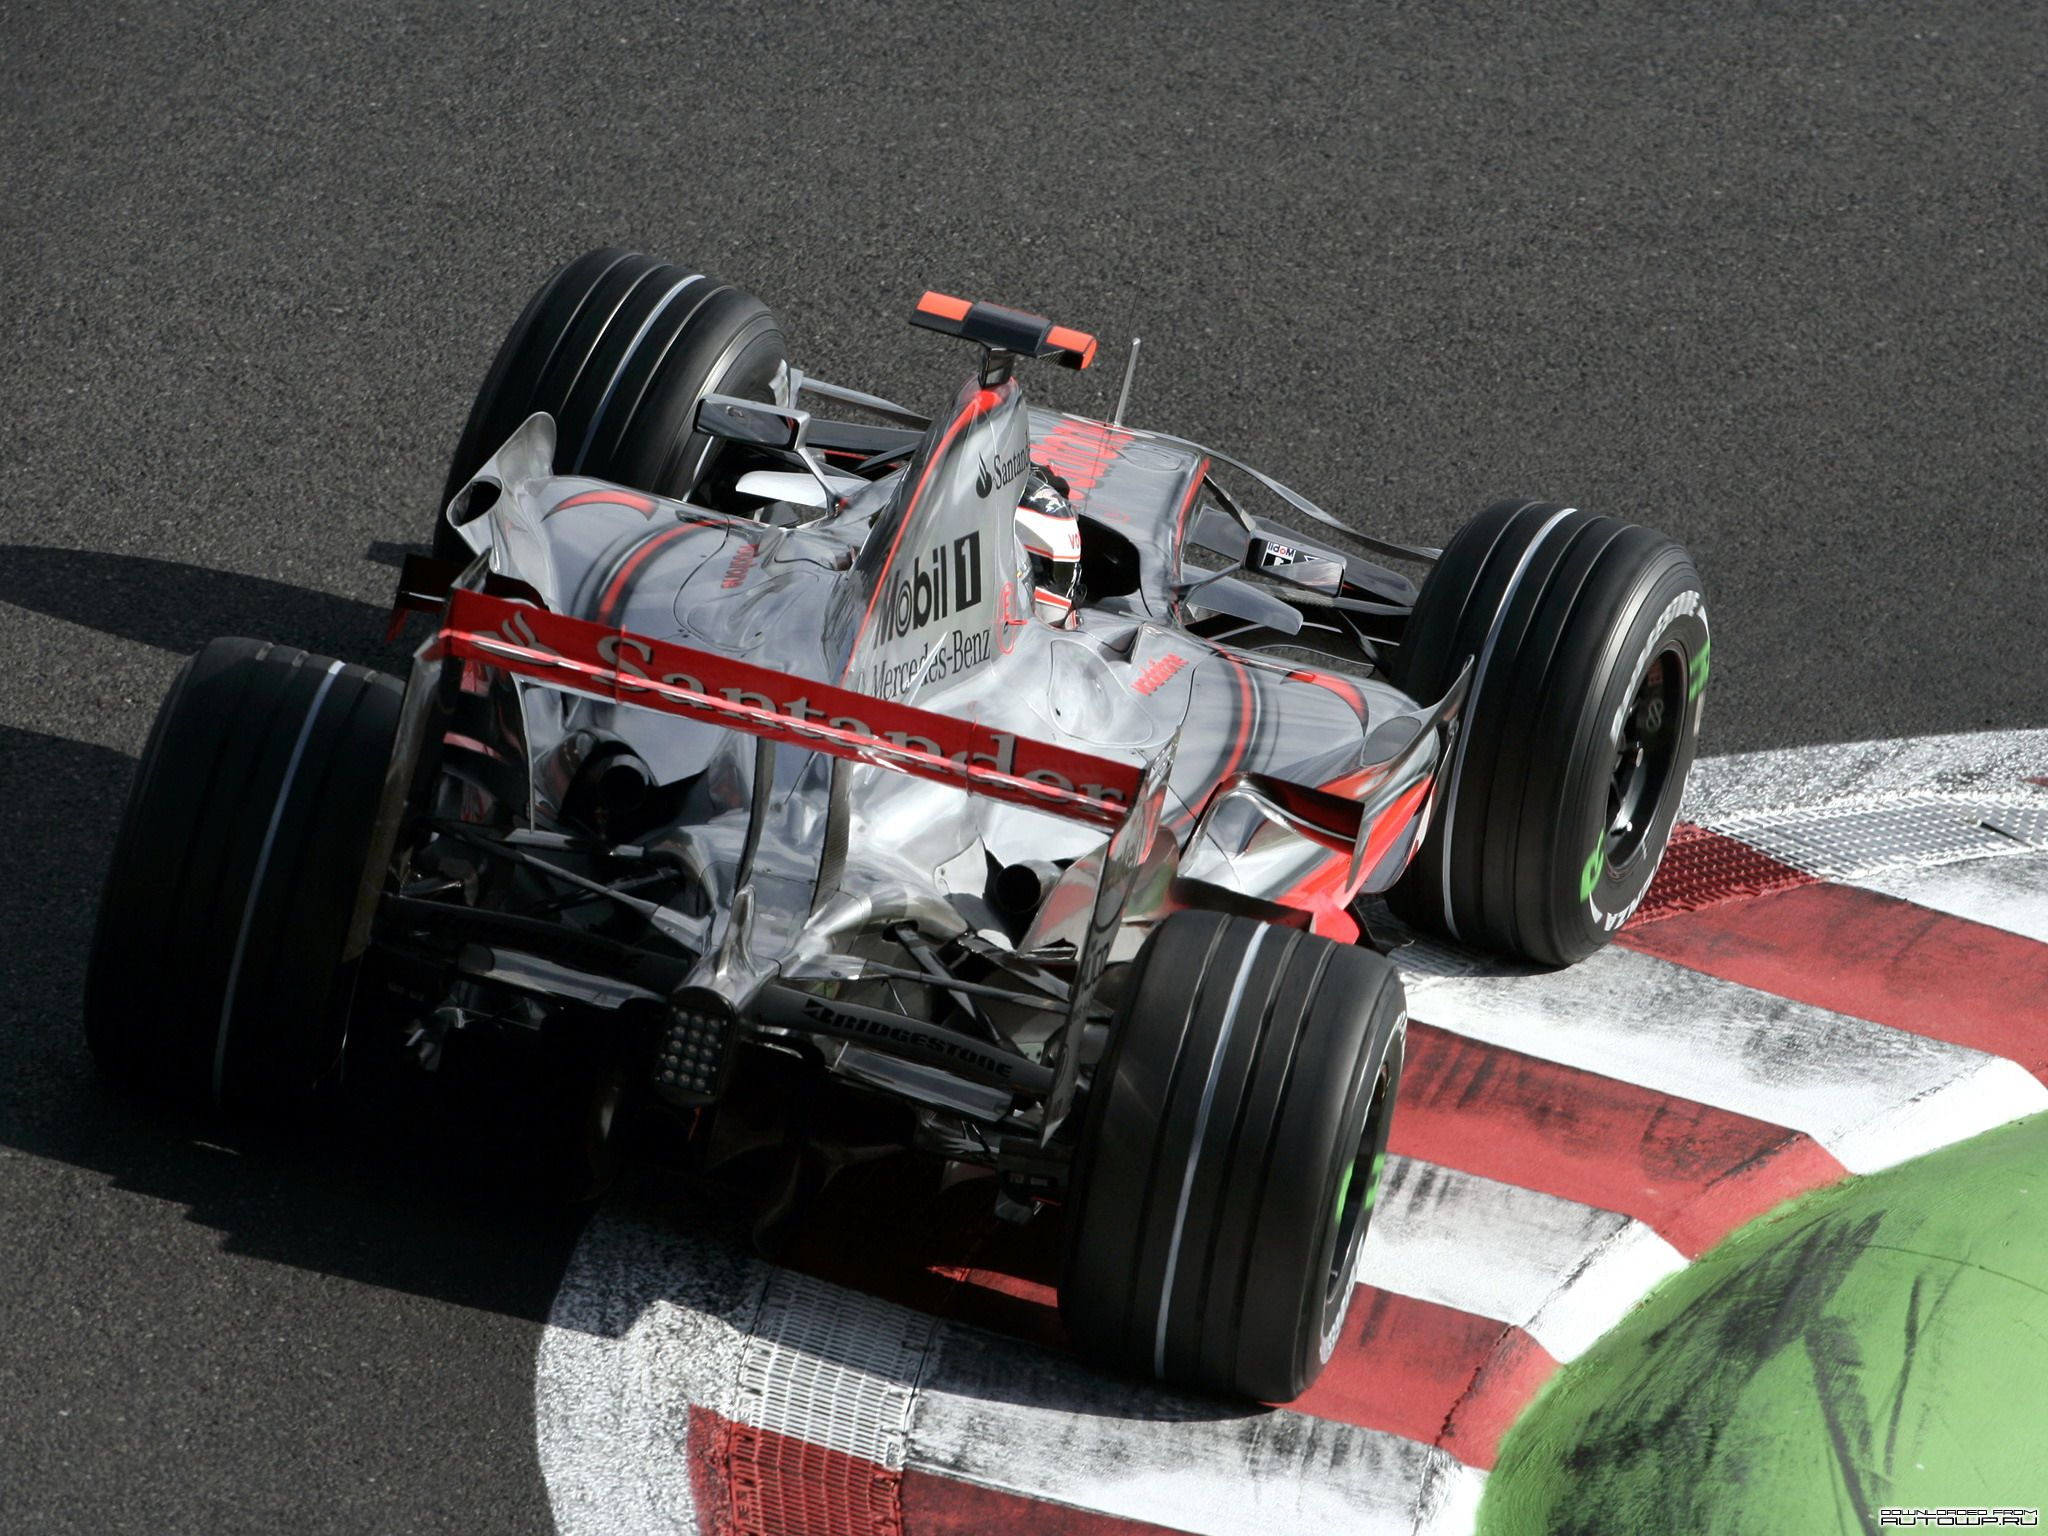 Formel 1 - Hintergrundbilder für den Desktop: http://wallpapic.de/sport/formel-1/wallpaper-21588